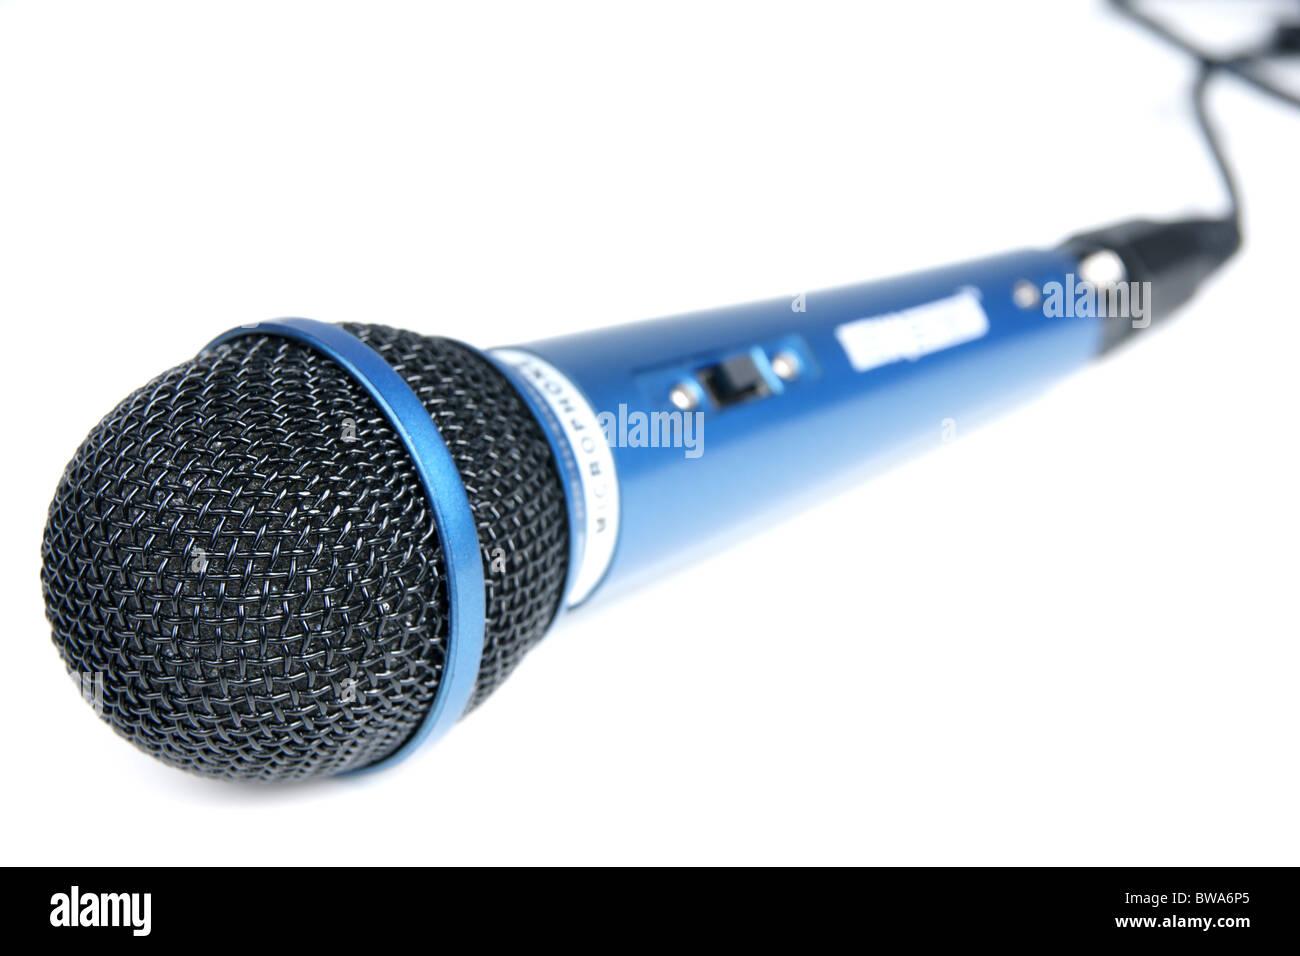 Blue big microphone to karaoke miusic close-up - Stock Image